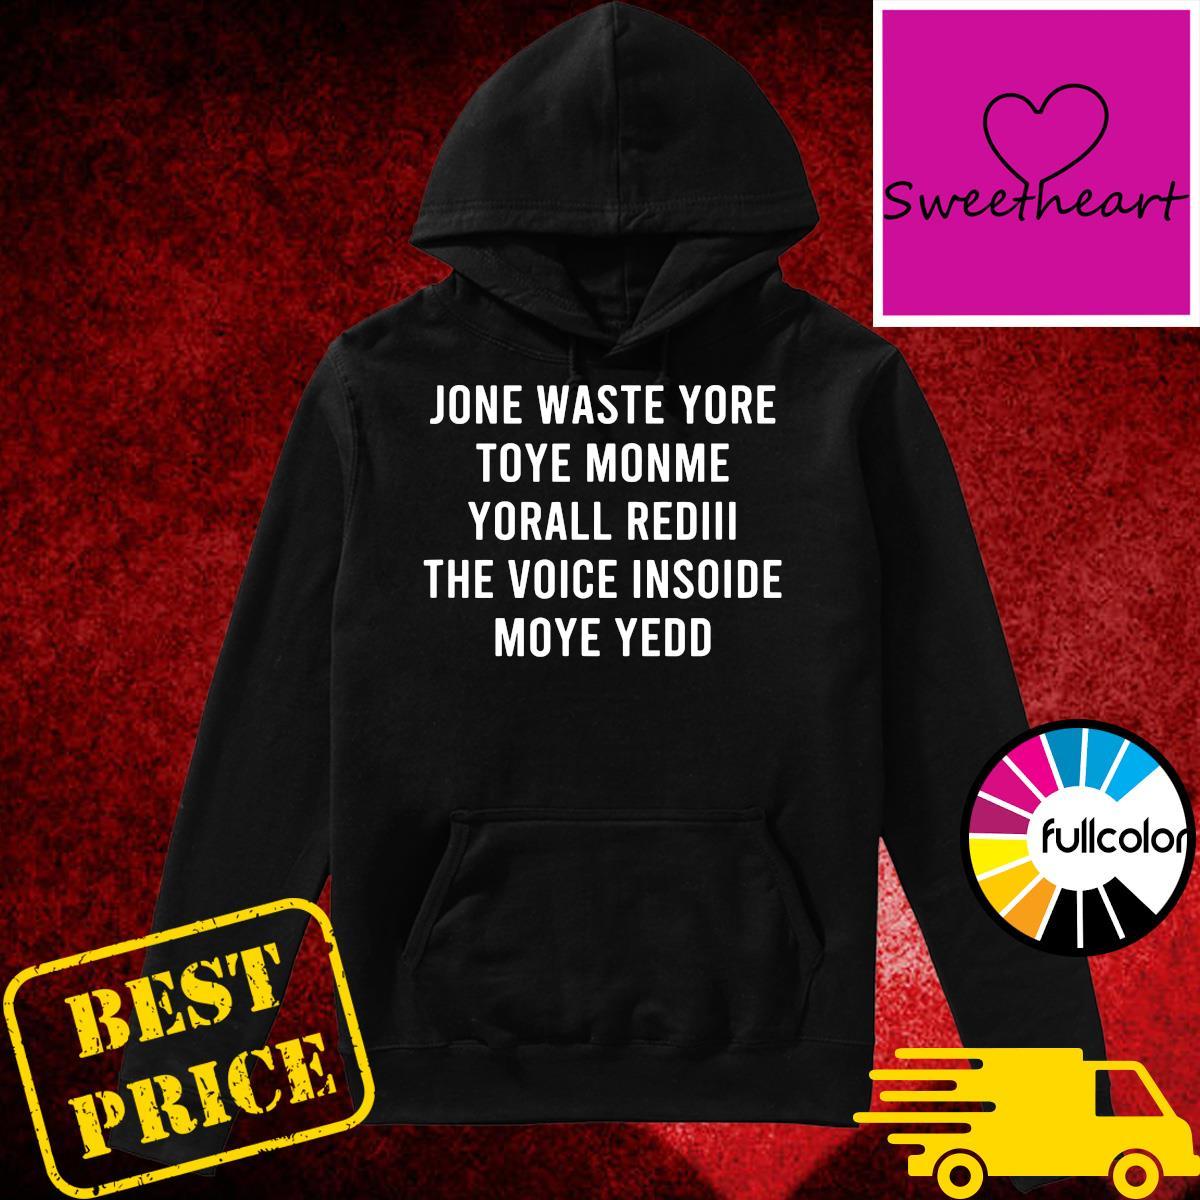 Official Jone Waste Yore Toye Monme Yorall Rediii Shirt Hoodie